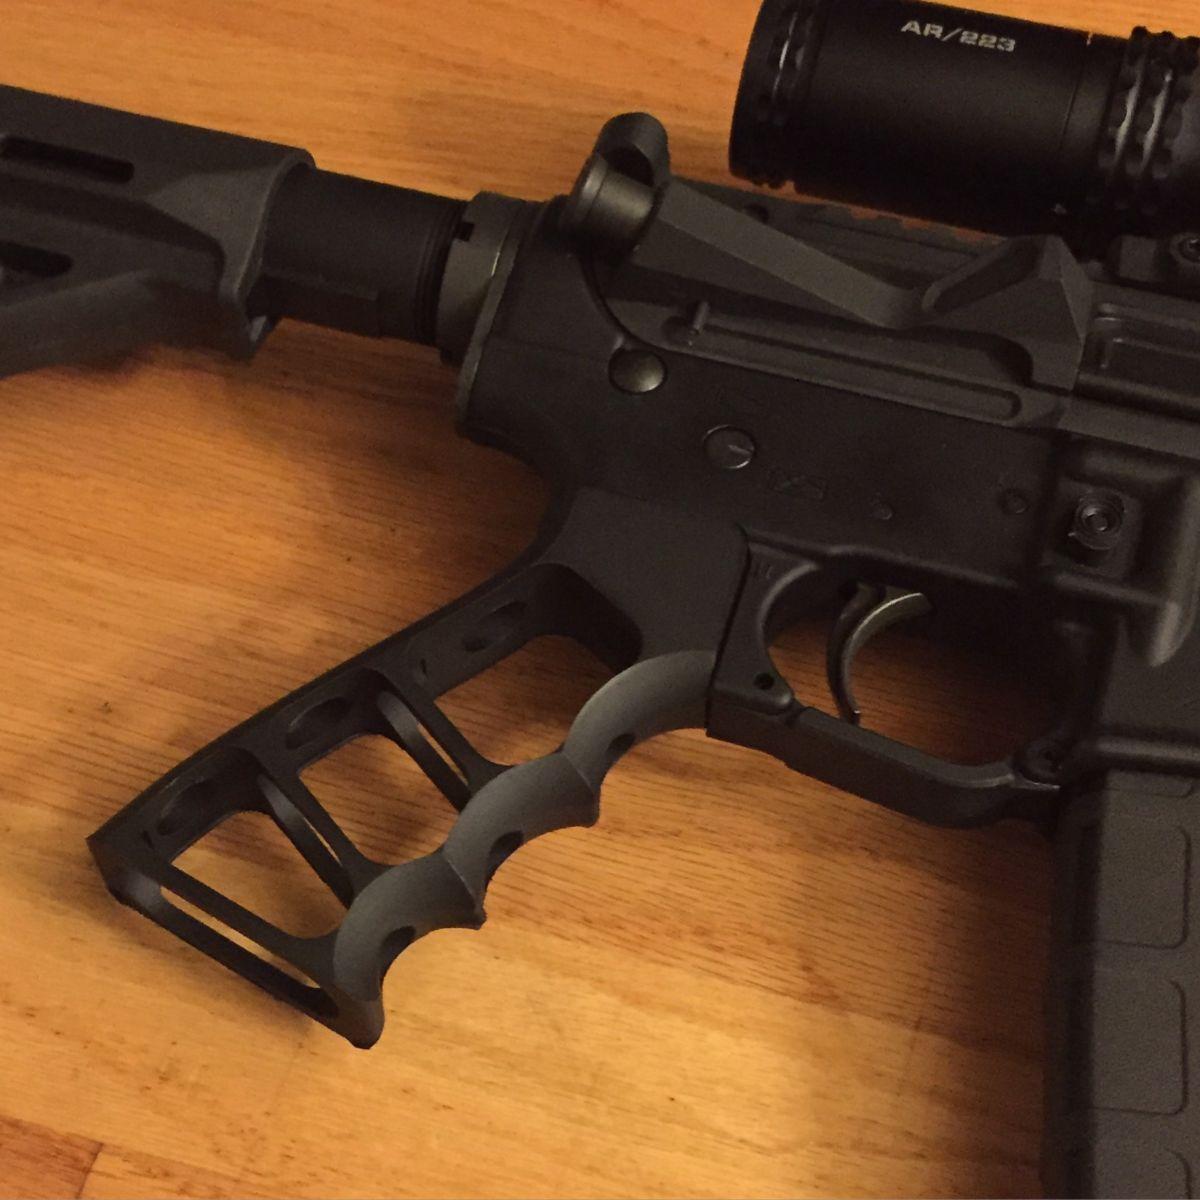 Skeletonized Grip Anodized Black   Assault rifle   Ar pistol